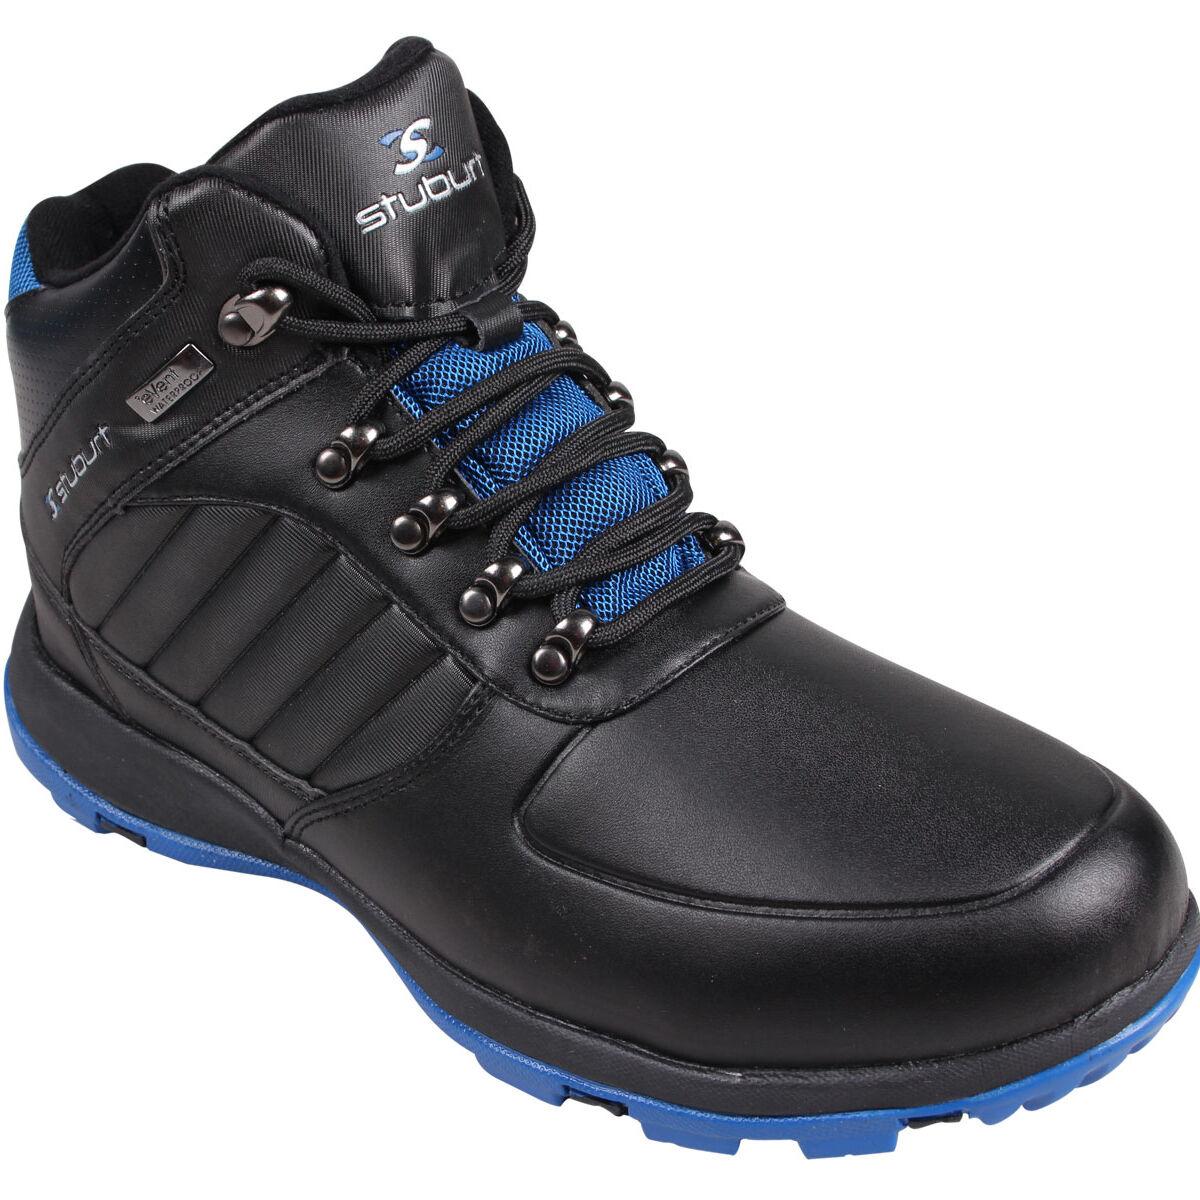 Stuburt Cyclone Boots from american golf